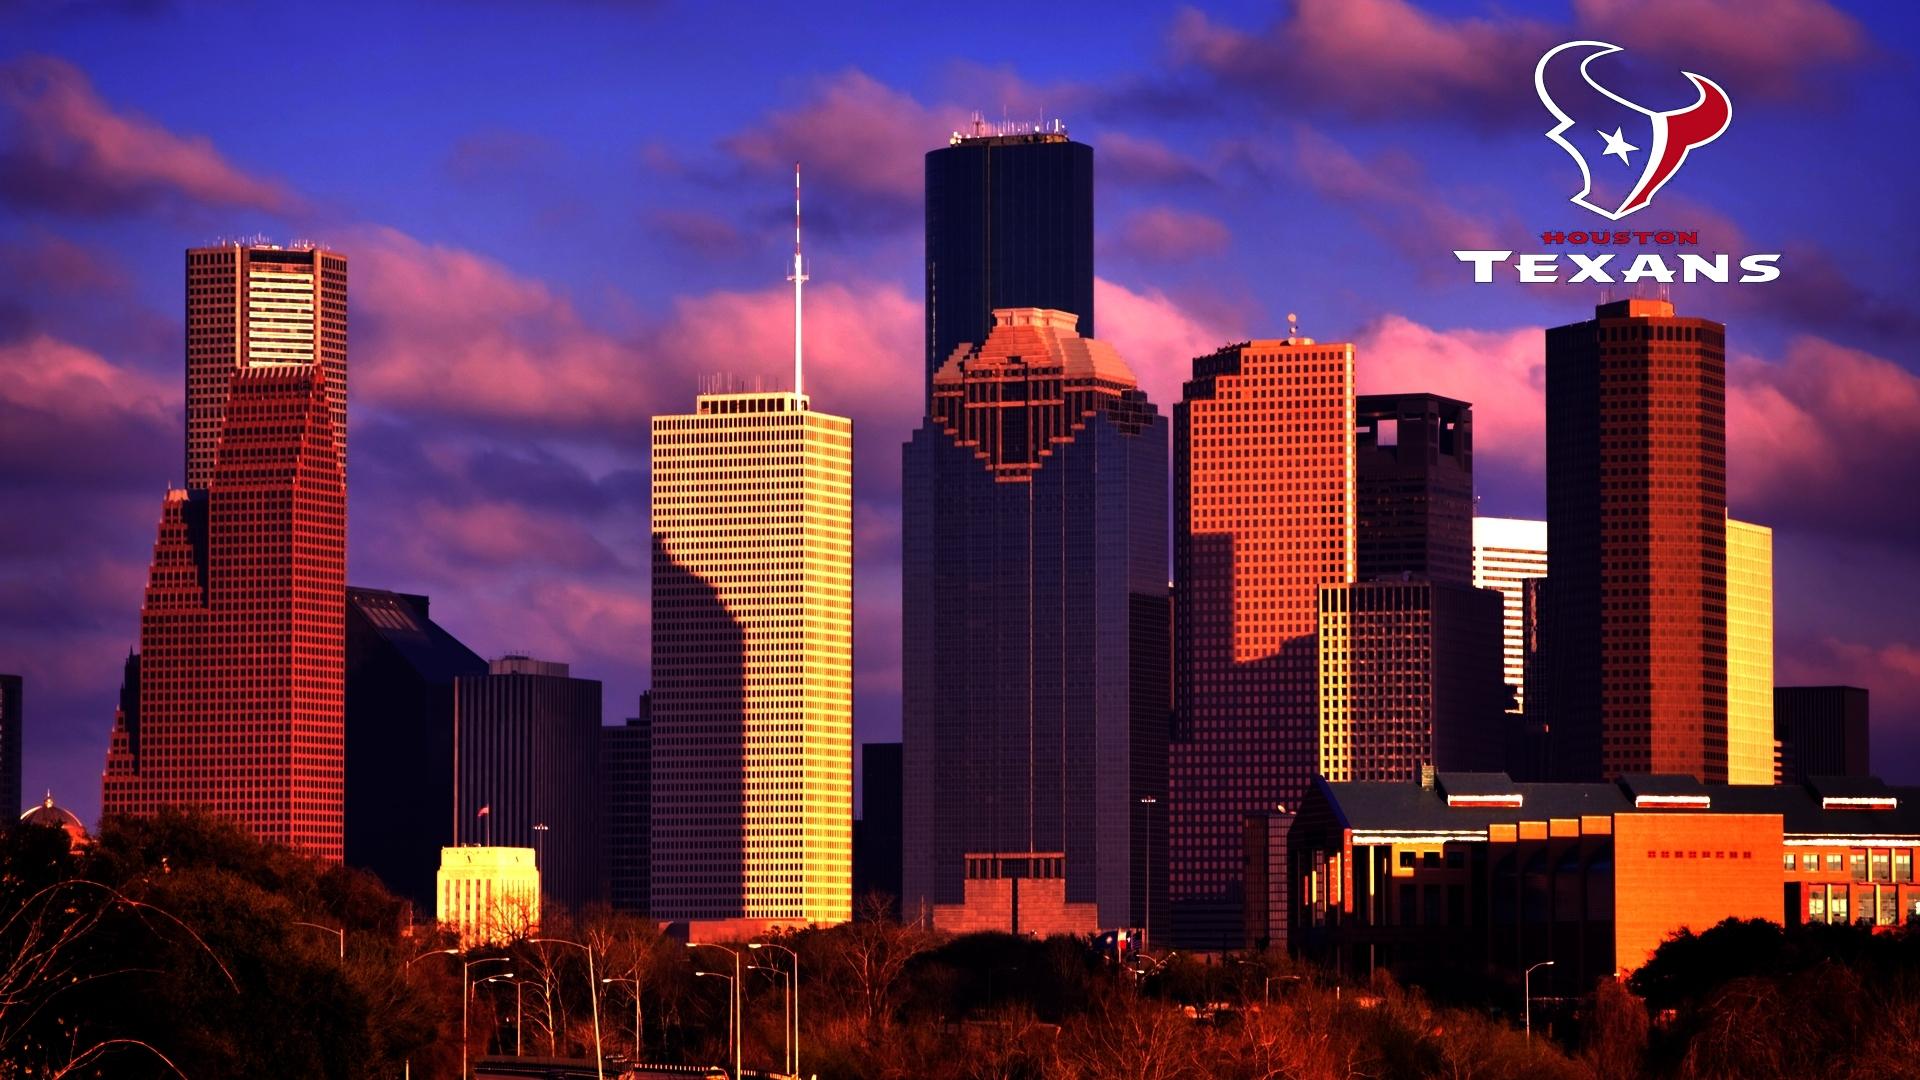 Wallpapers Houston Texans Logo 1280 X 800 55 Kb Jpeg HD Wallpapers 1920x1080